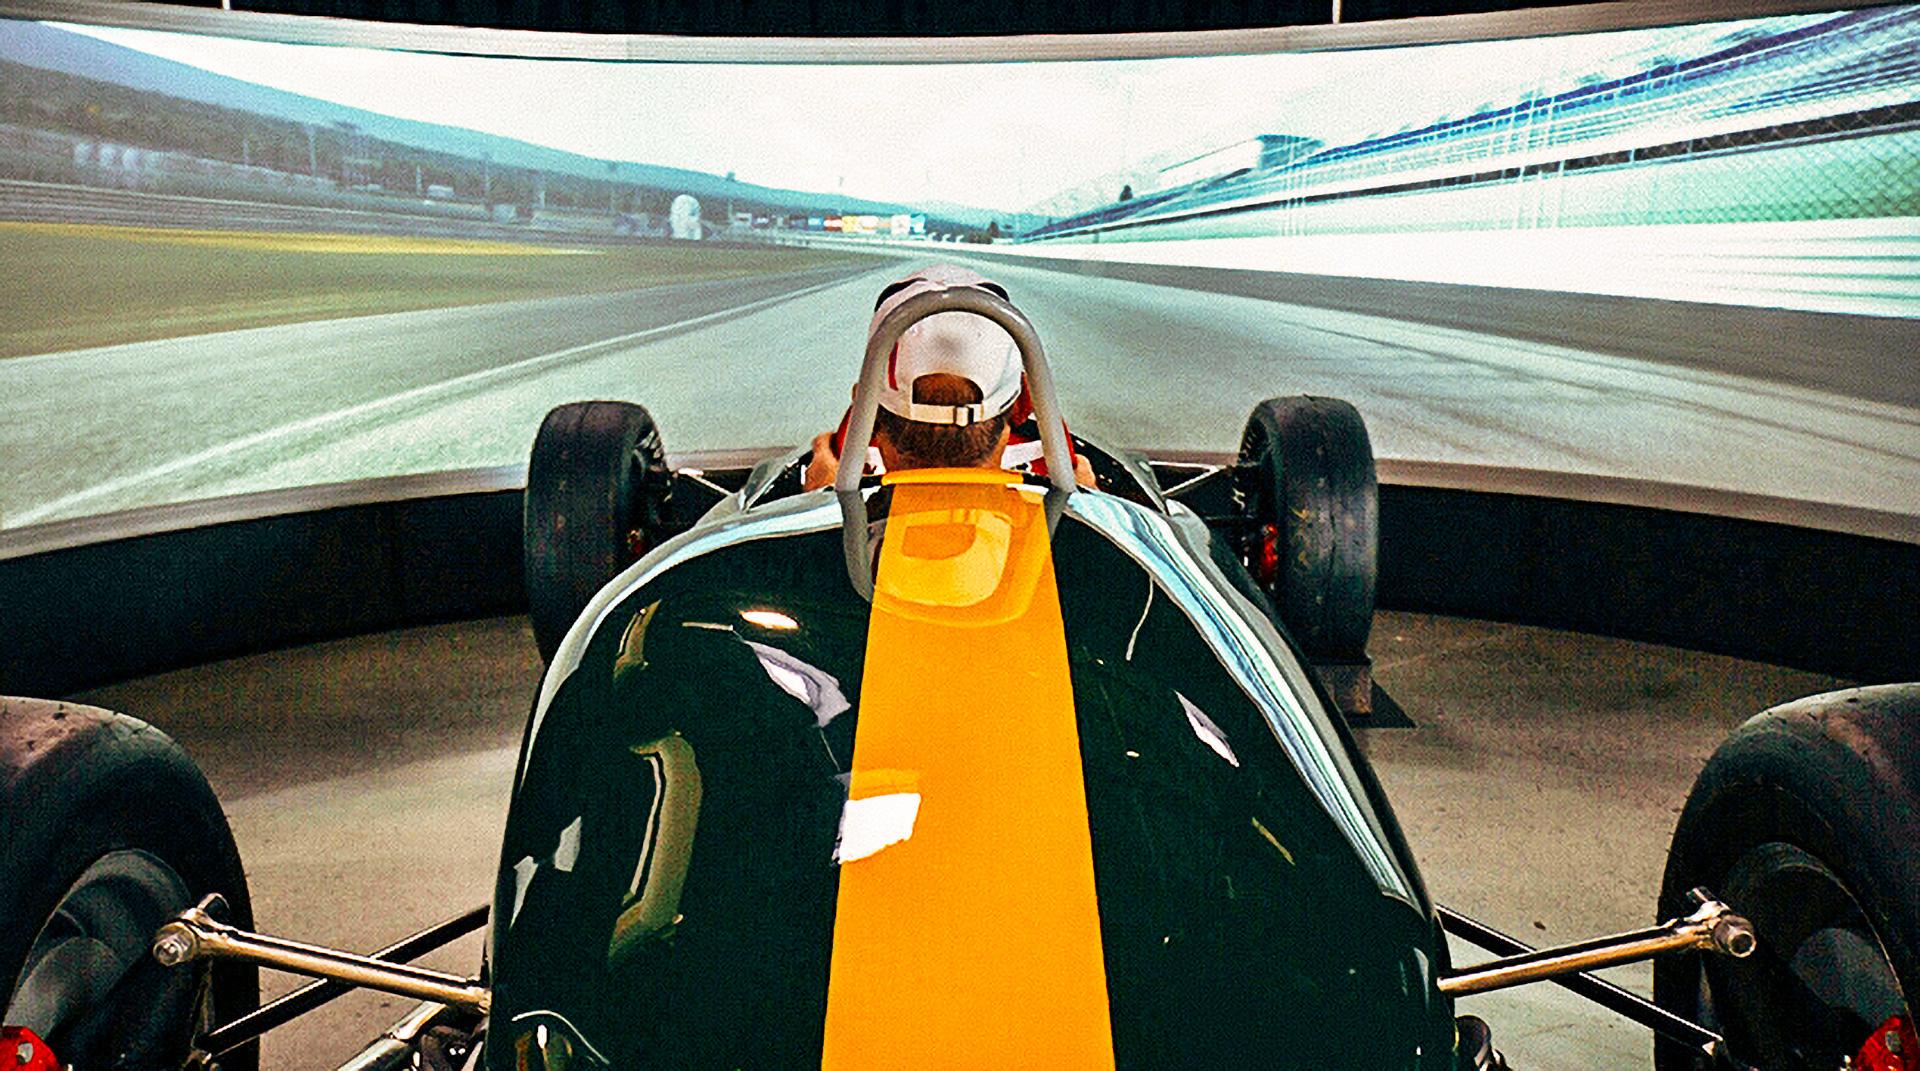 1962 Lotus simulator at the World of Speed Museum